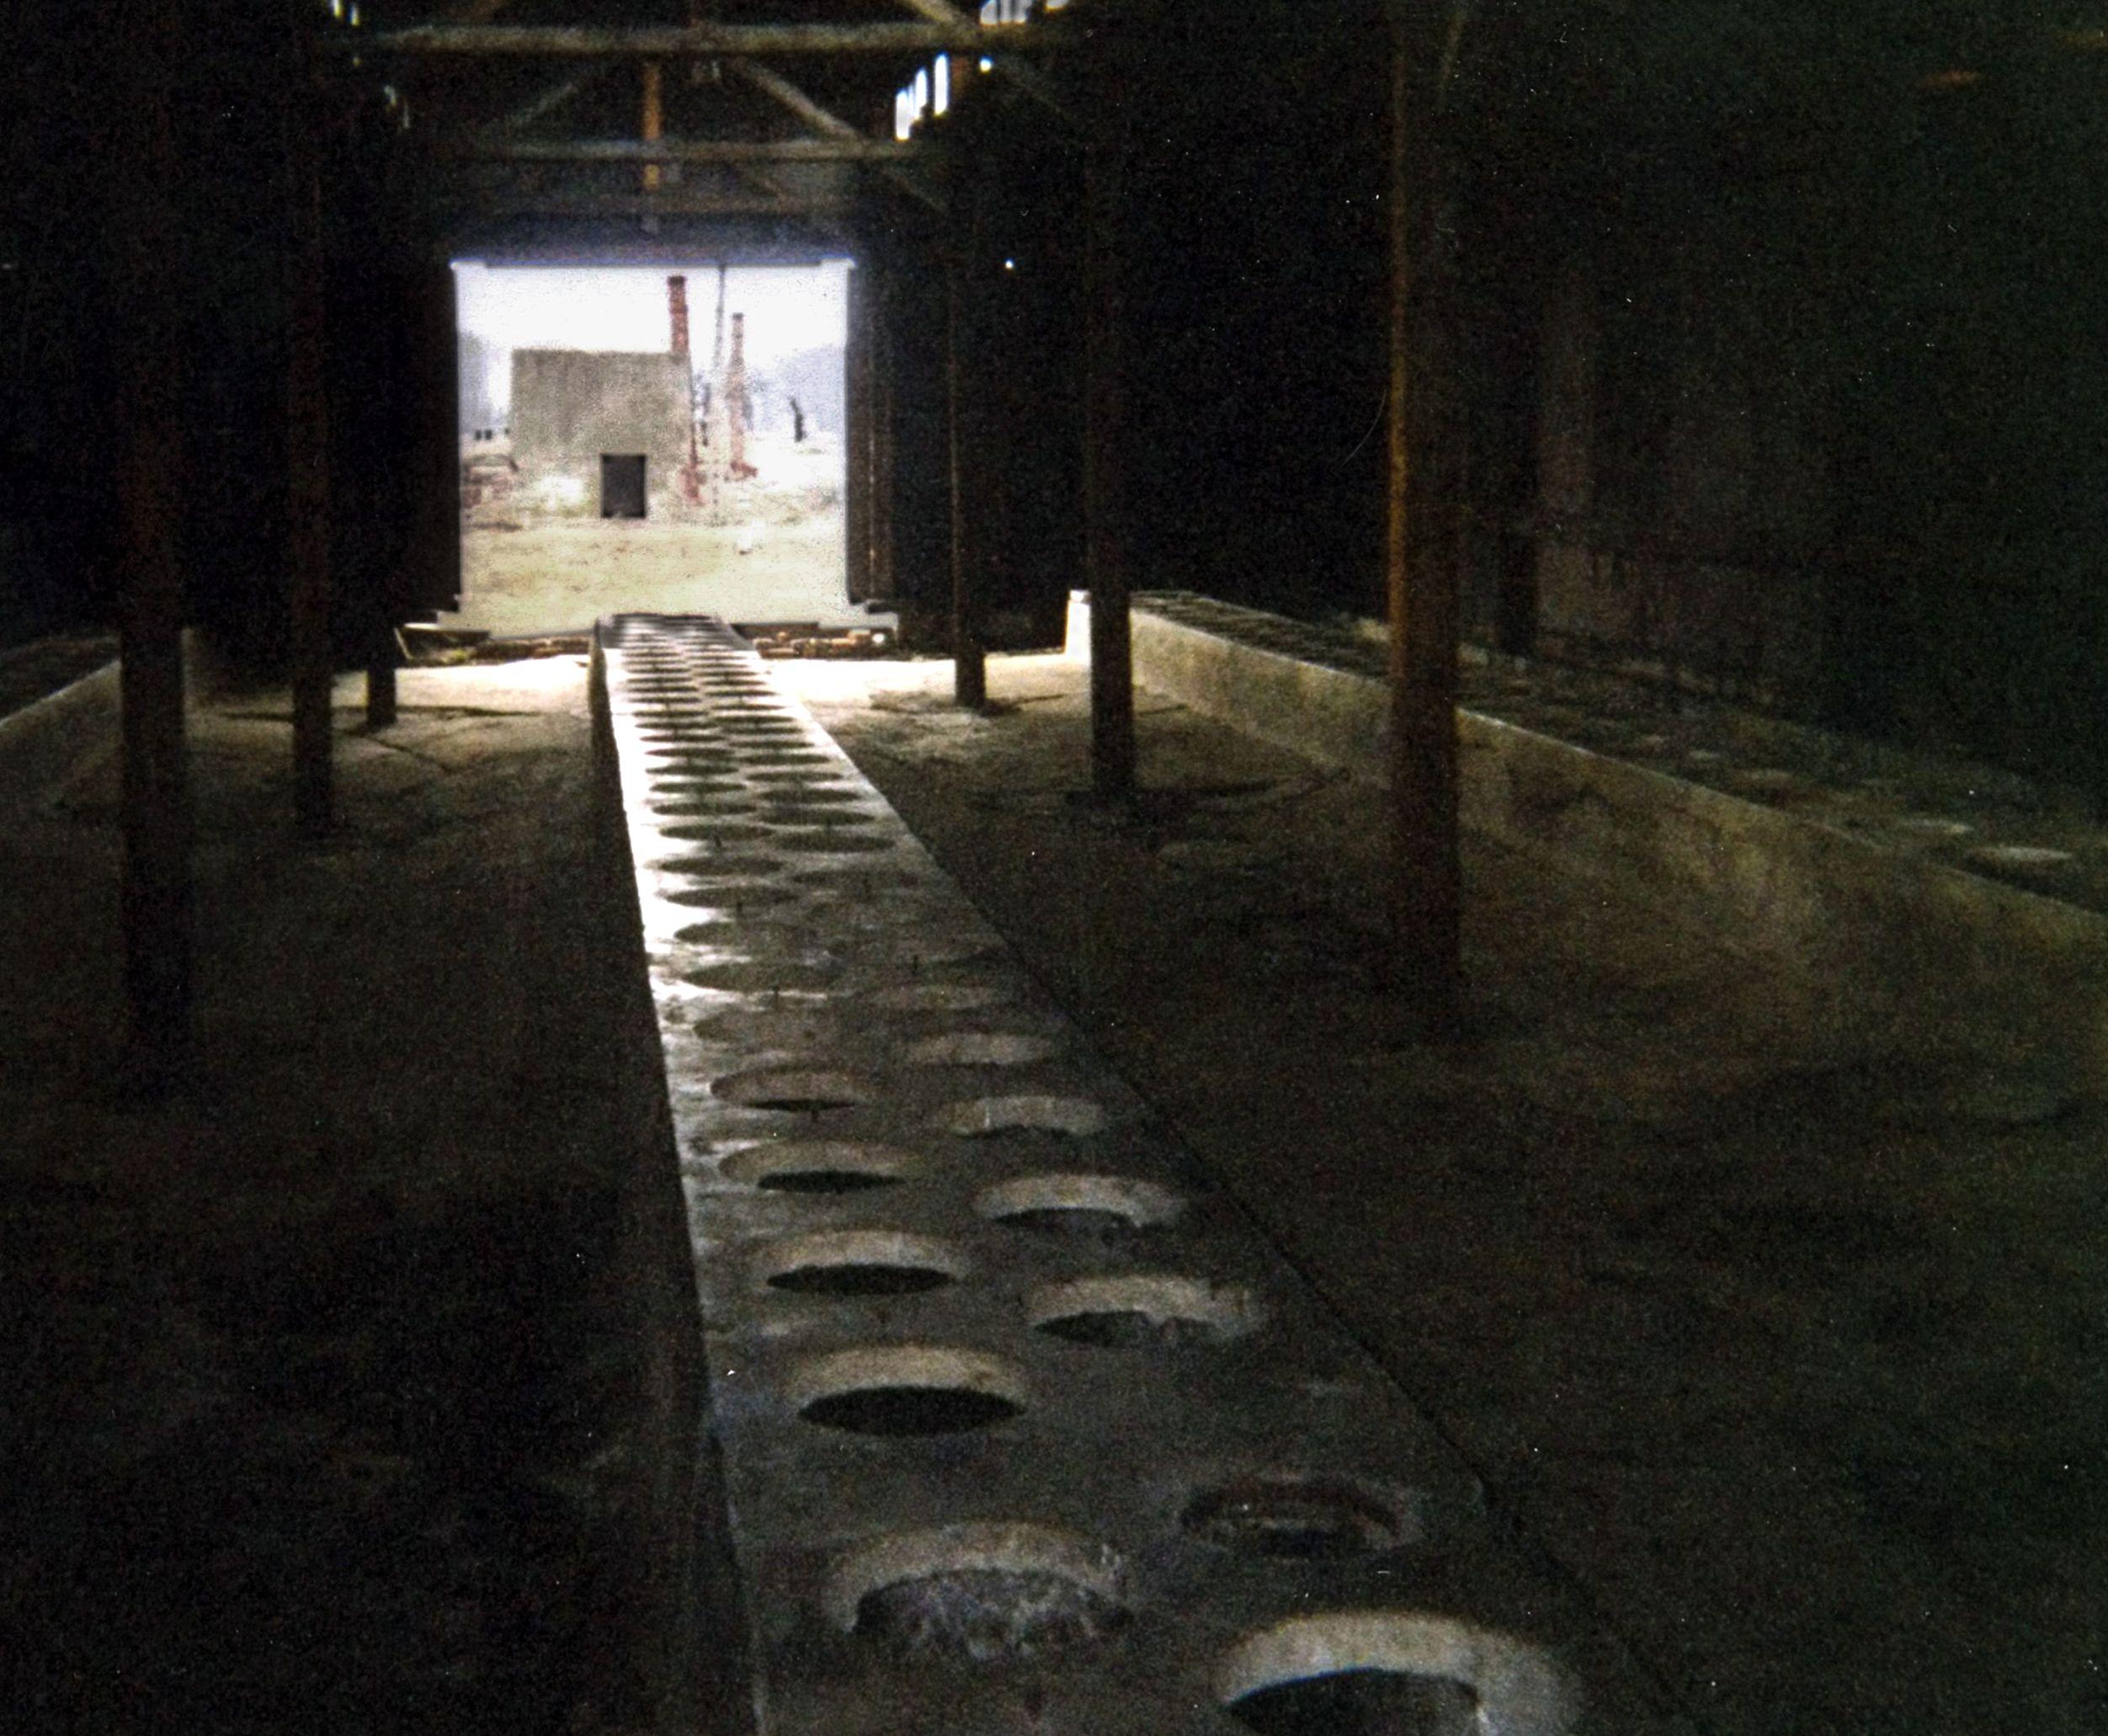 Pin On Sightseeing Trip To Auschwitz